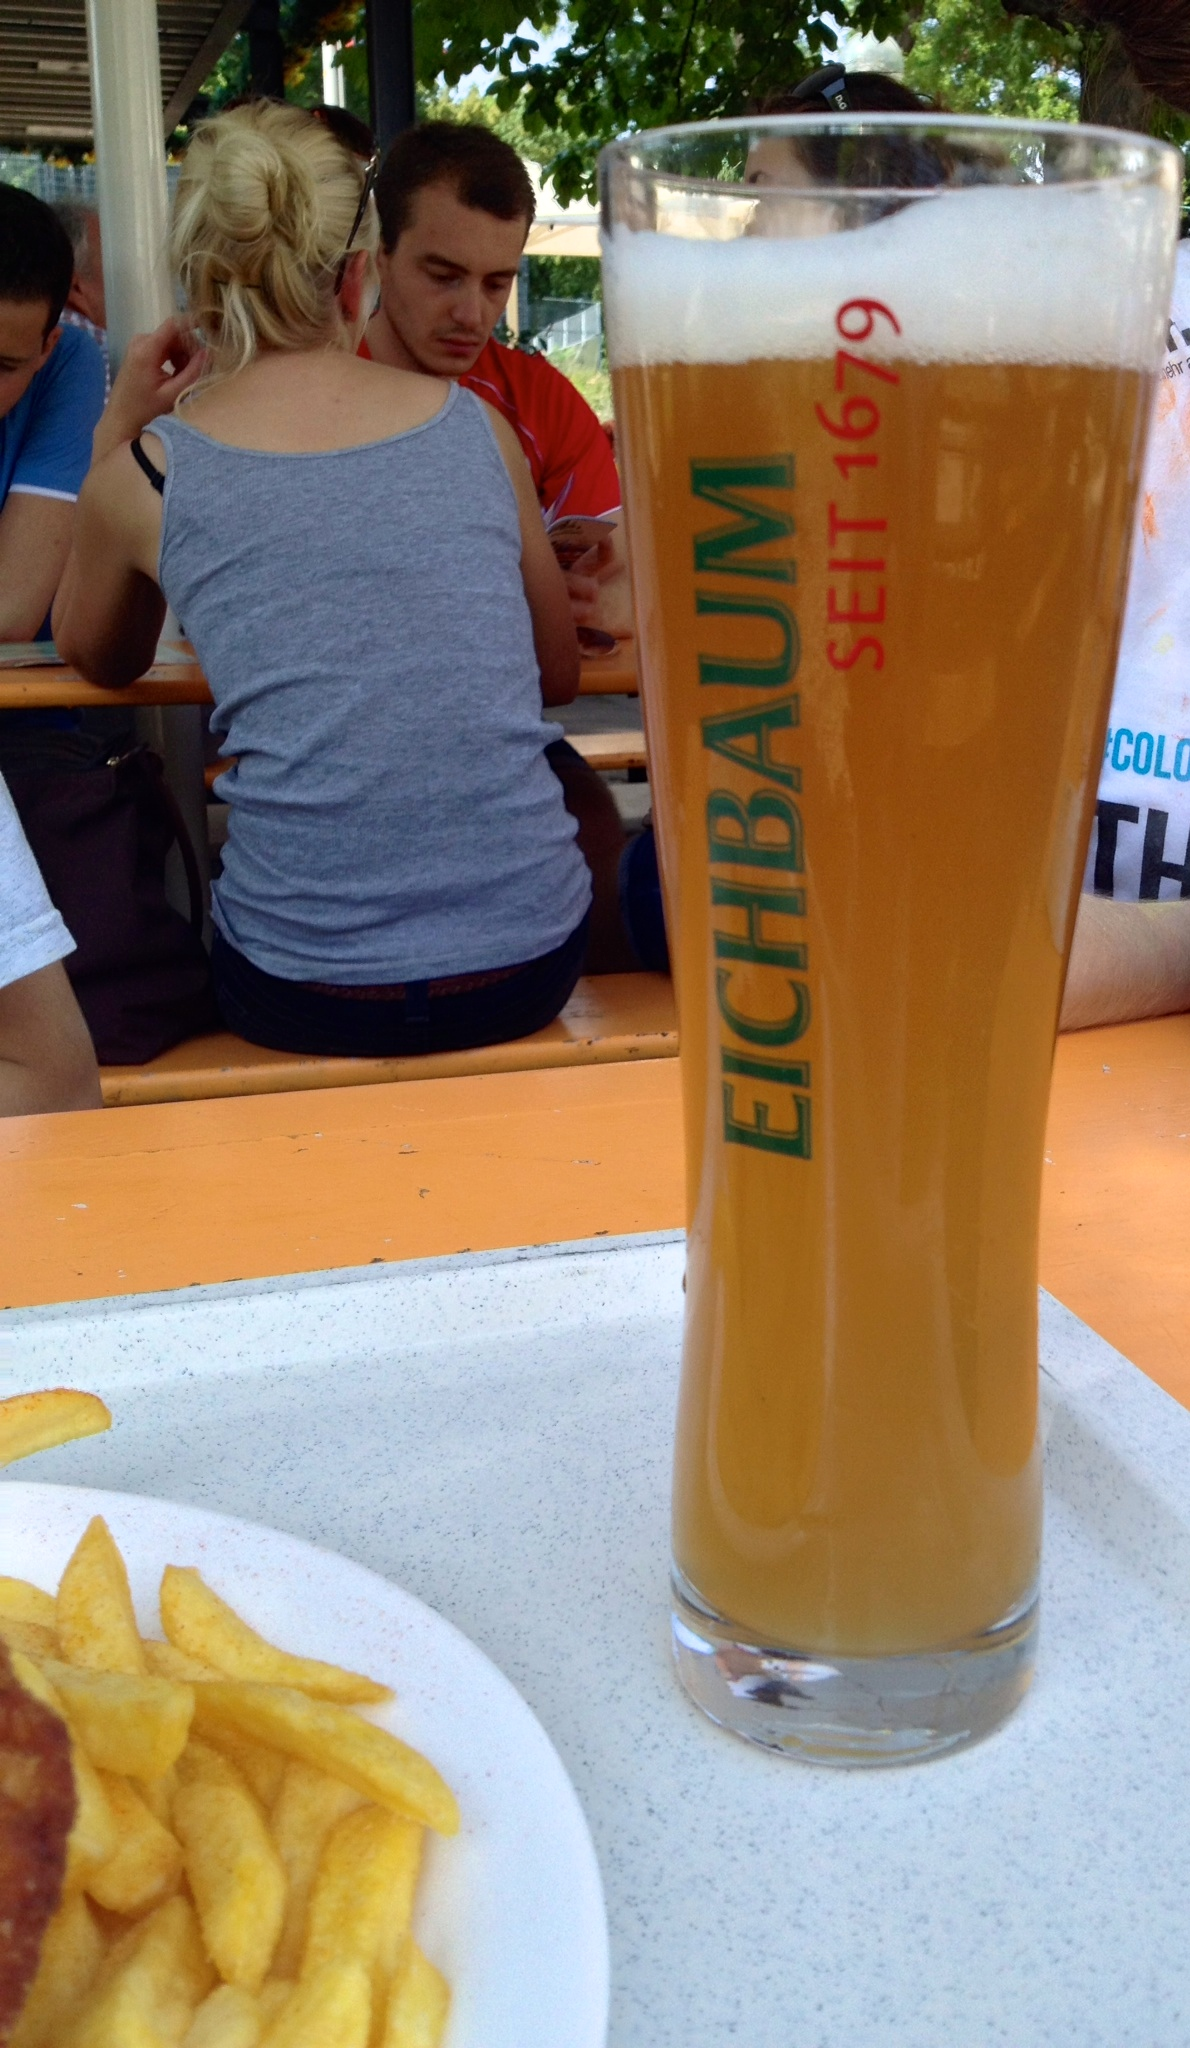 A half liter of hefeweizen